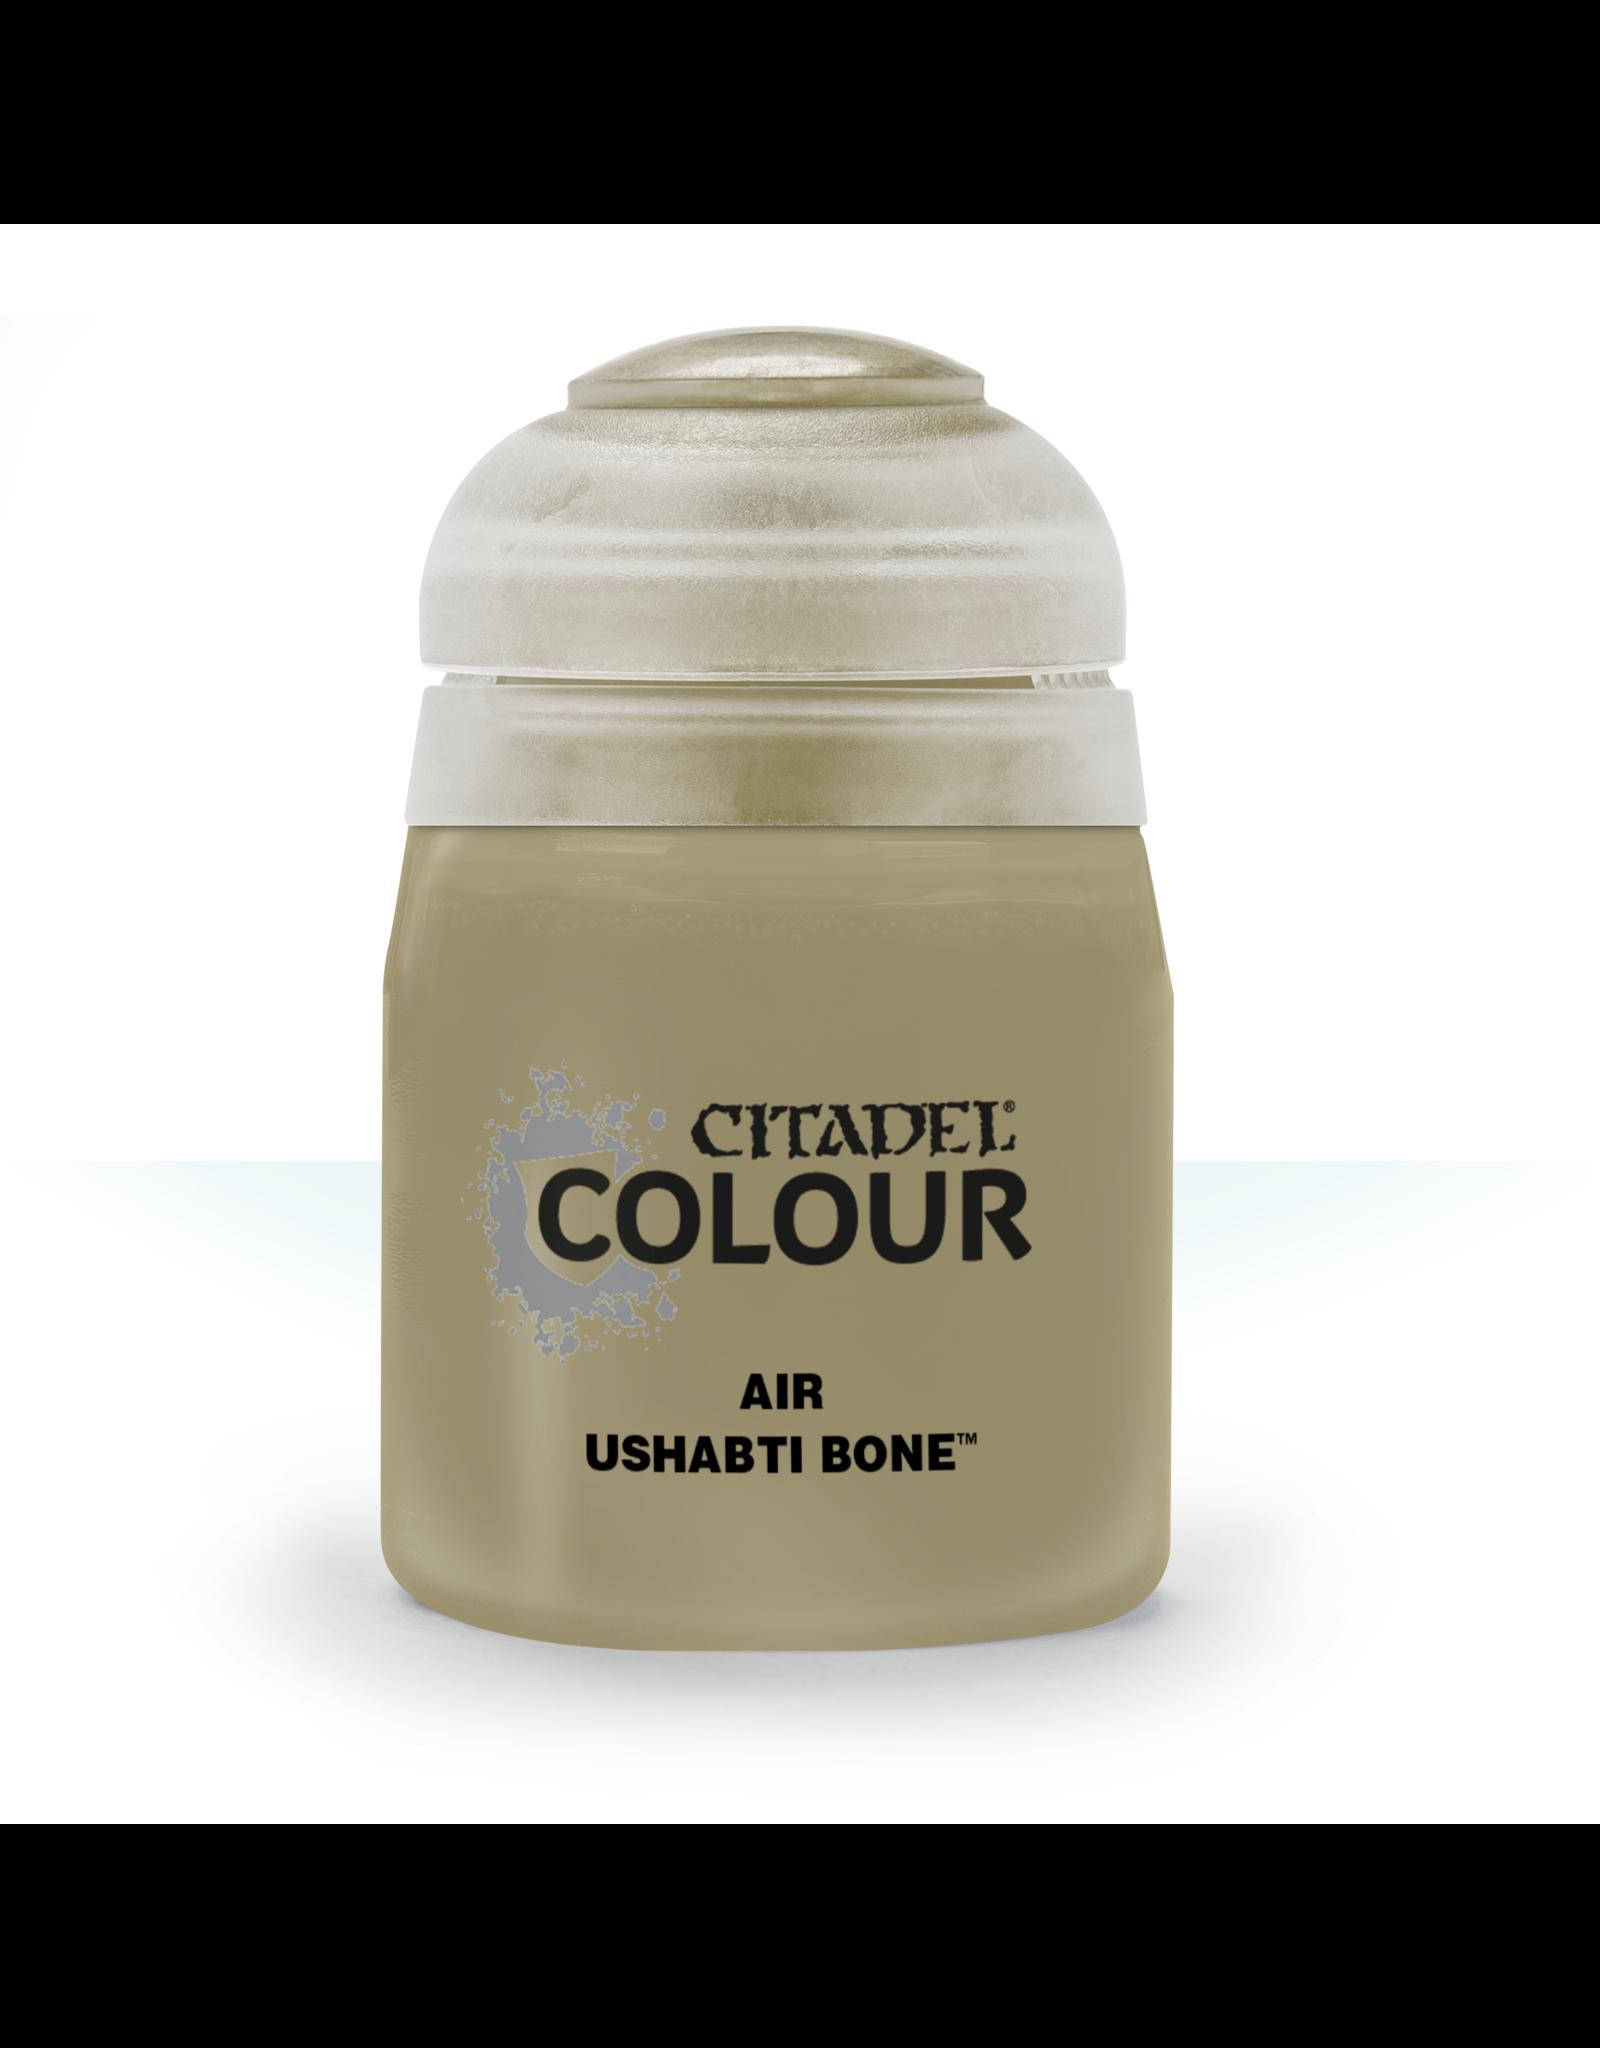 Citadel Citadel Paints: Air - Ushabti Bone